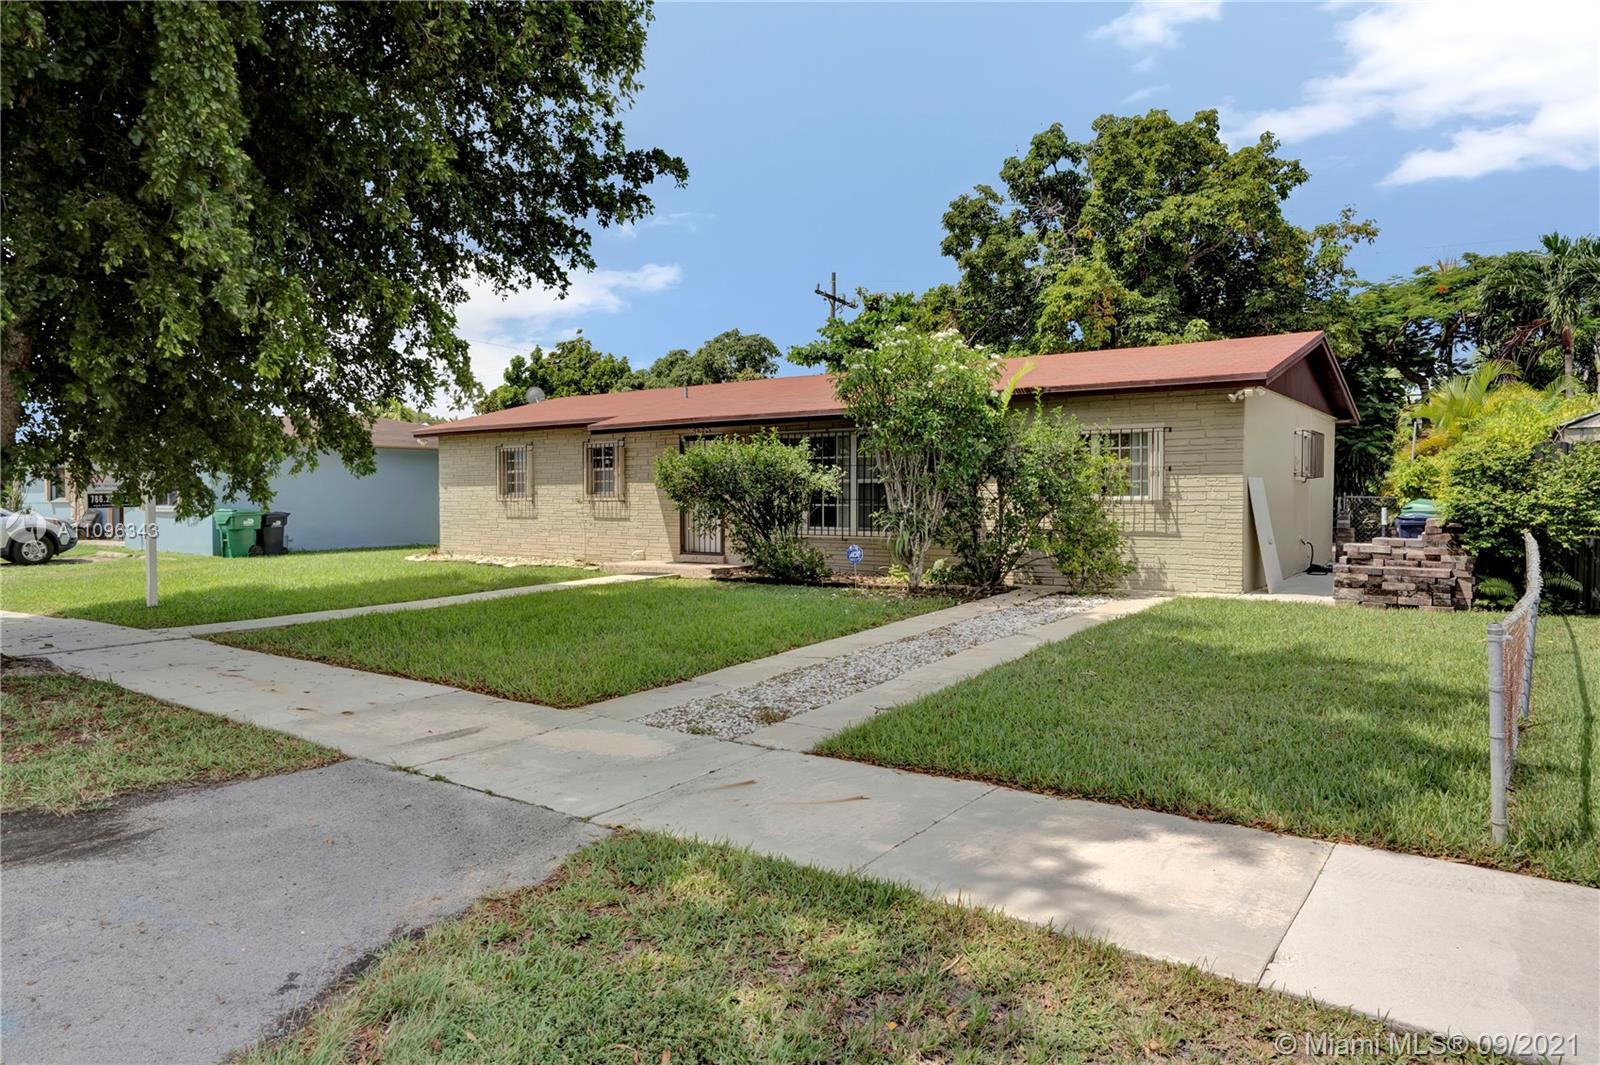 Single Family Home,For Sale,6130 SW 108th Pl, Miami, Florida 33173,Brickell,realty,broker,condos near me